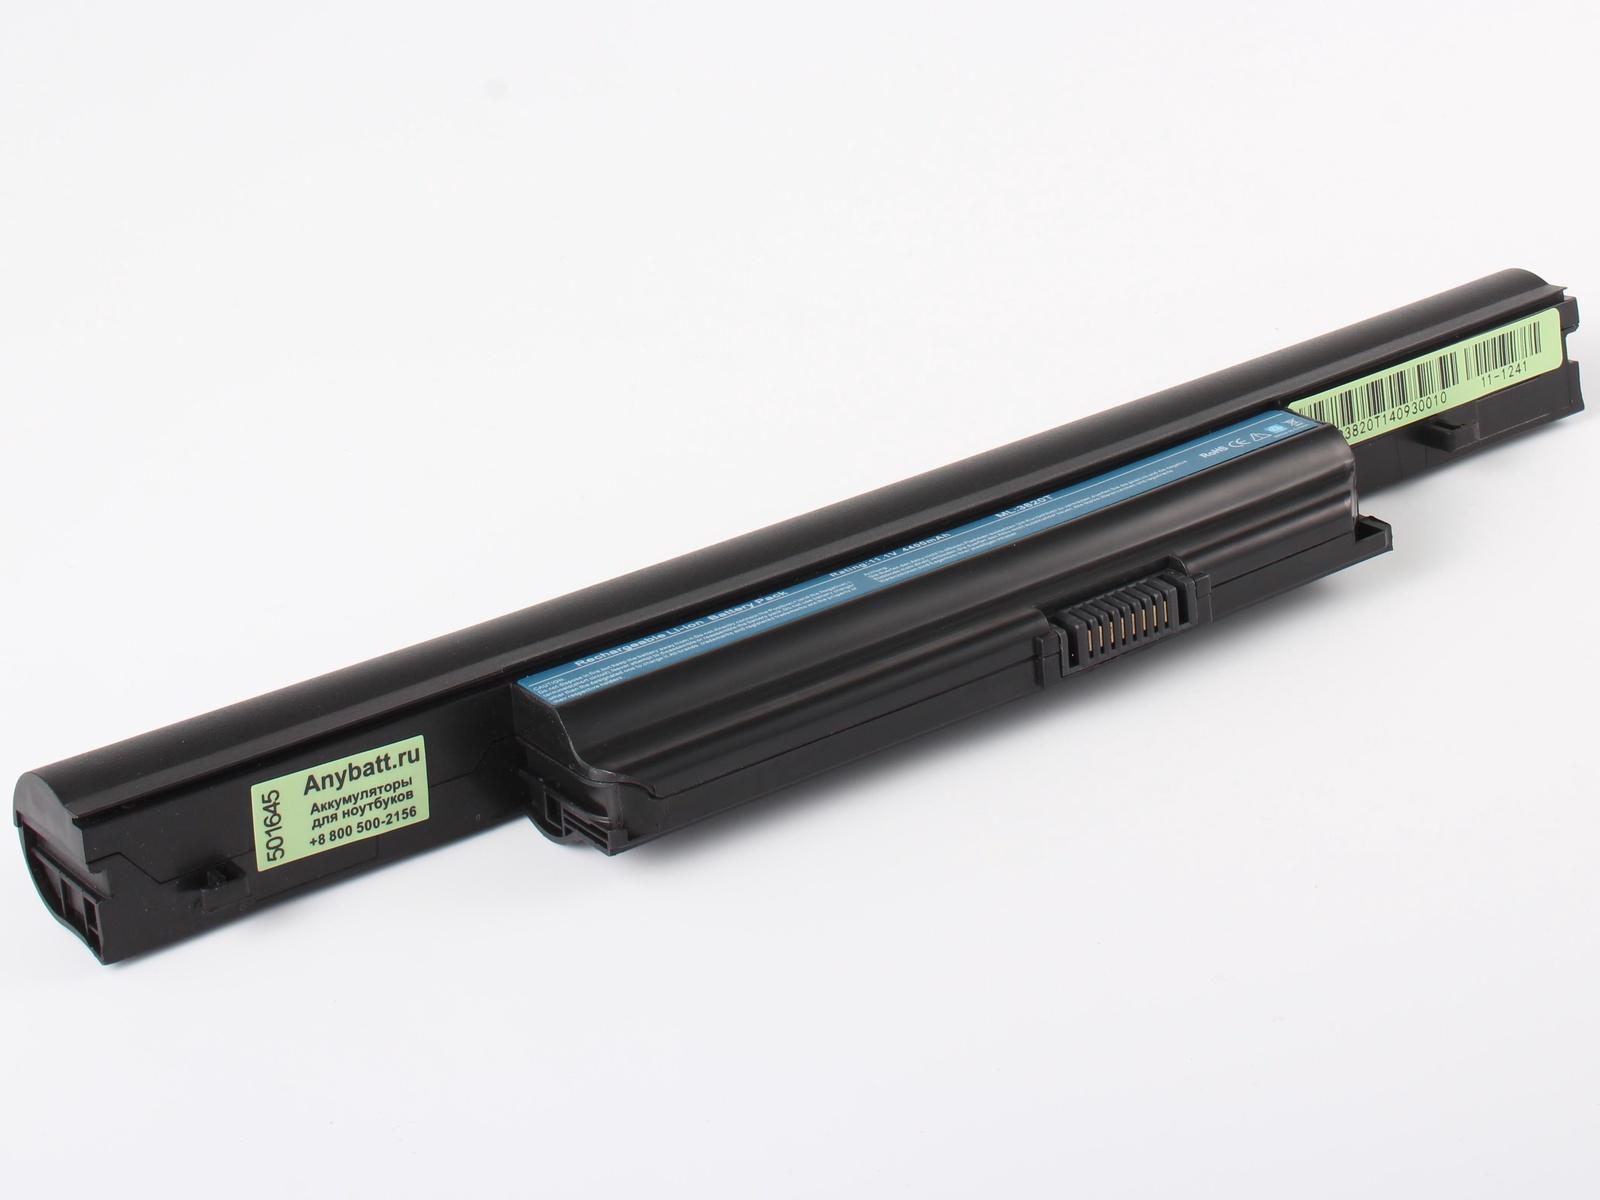 Фото - Аккумулятор для ноутбука AnyBatt Acer, Packard Bell AS10B31, AS10B3E, AS10B7E, AS10E7E, AS10B5E, AS10B41, AS10B73, AS10E76, AS10B61, AS10B6E, AS10E36, AS10B51 аккумулятор